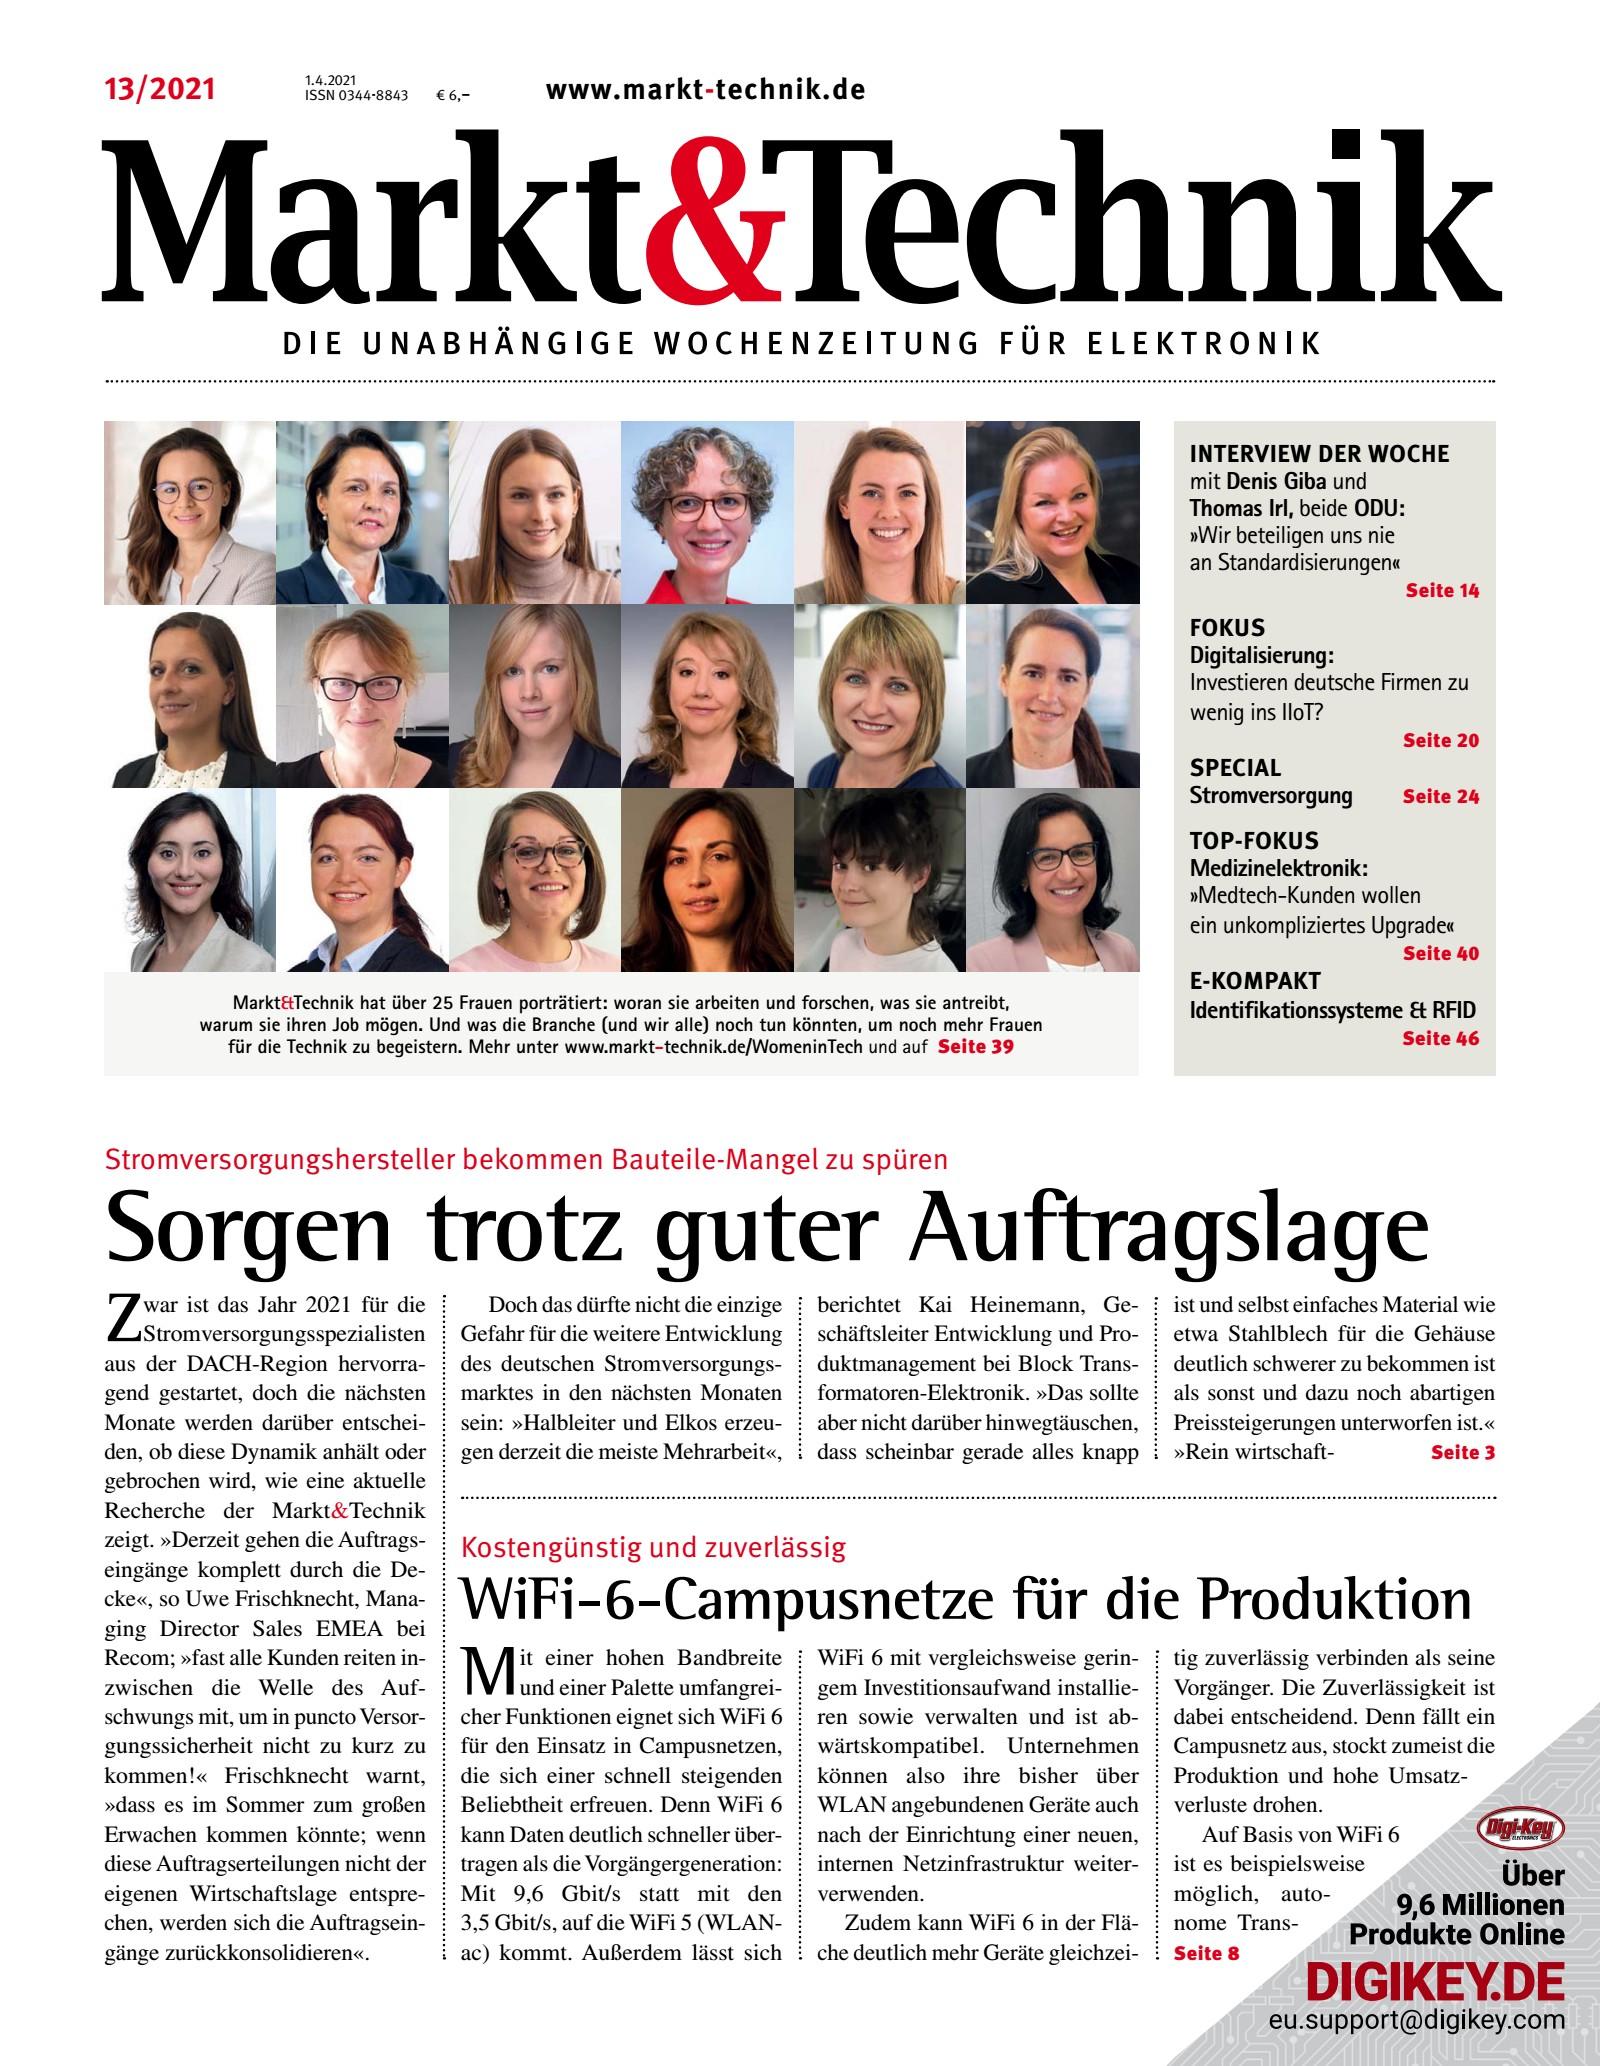 Markt&Technik Studentenabo